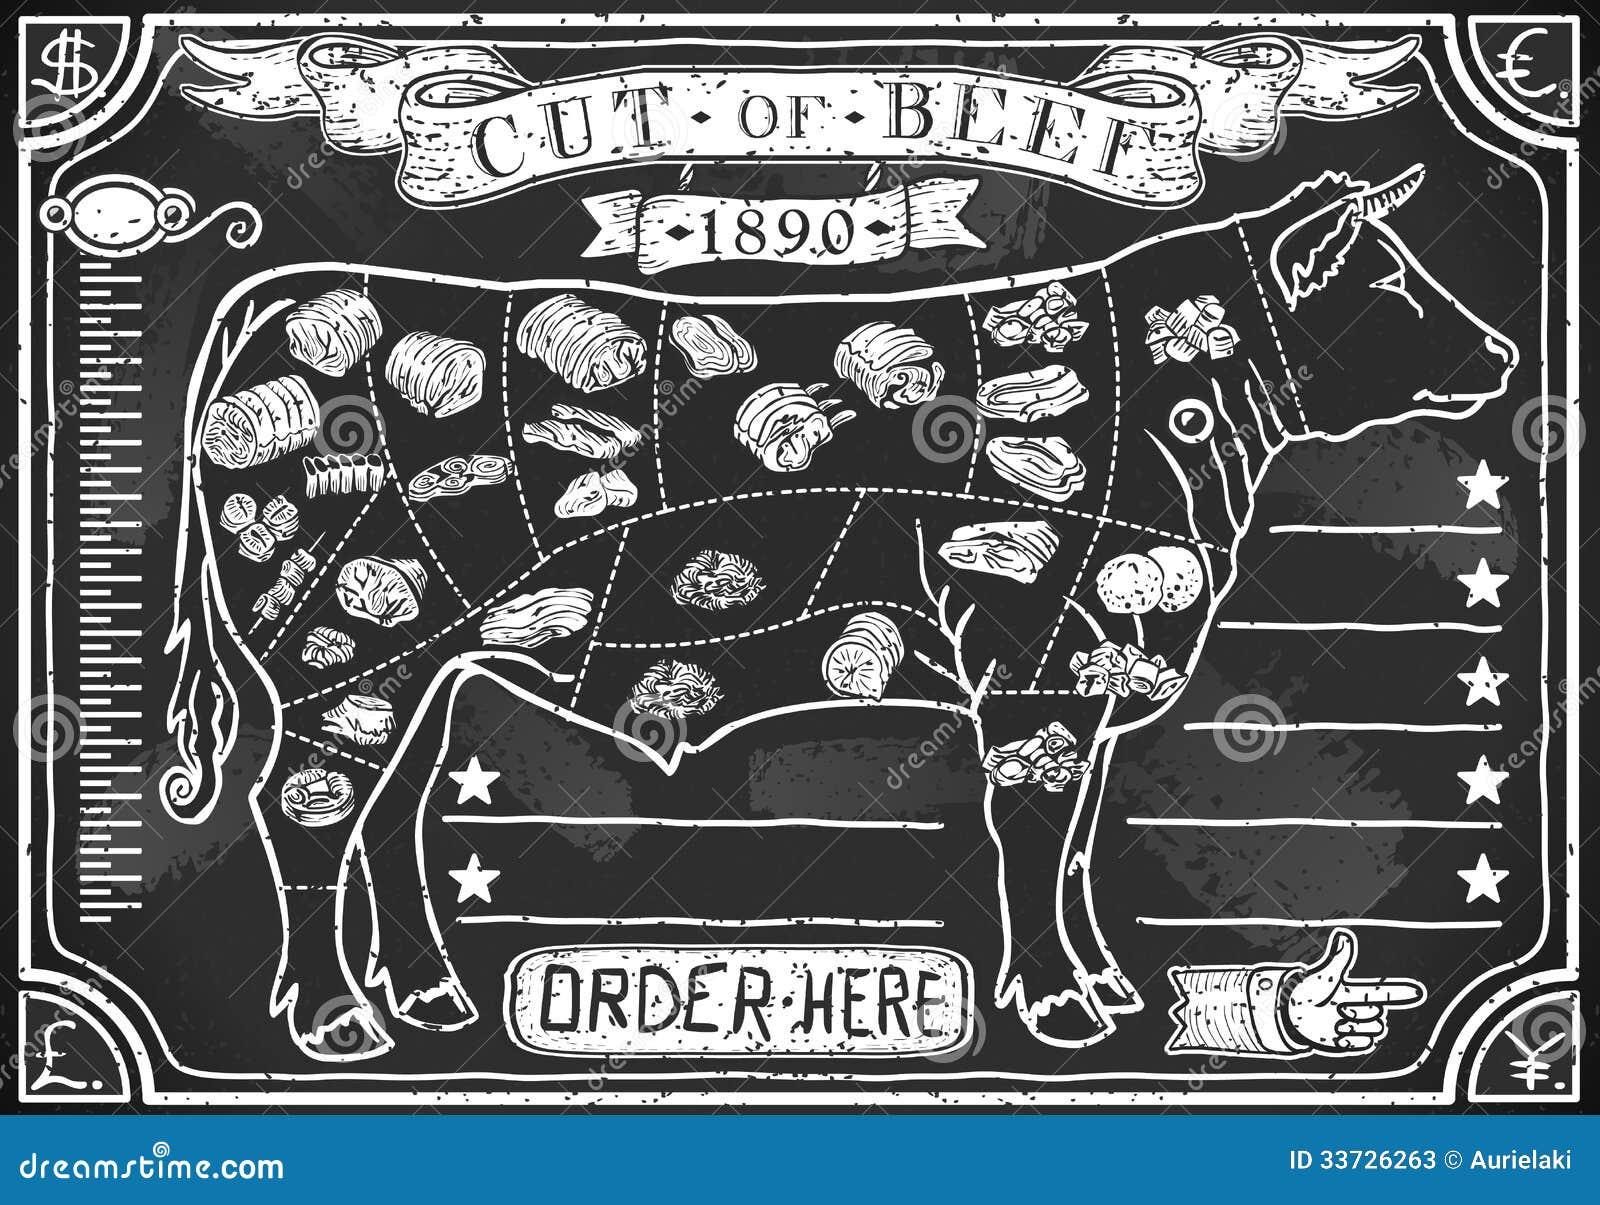 Vintage Graphic Blackboard For Butcher Shop Stock Photos